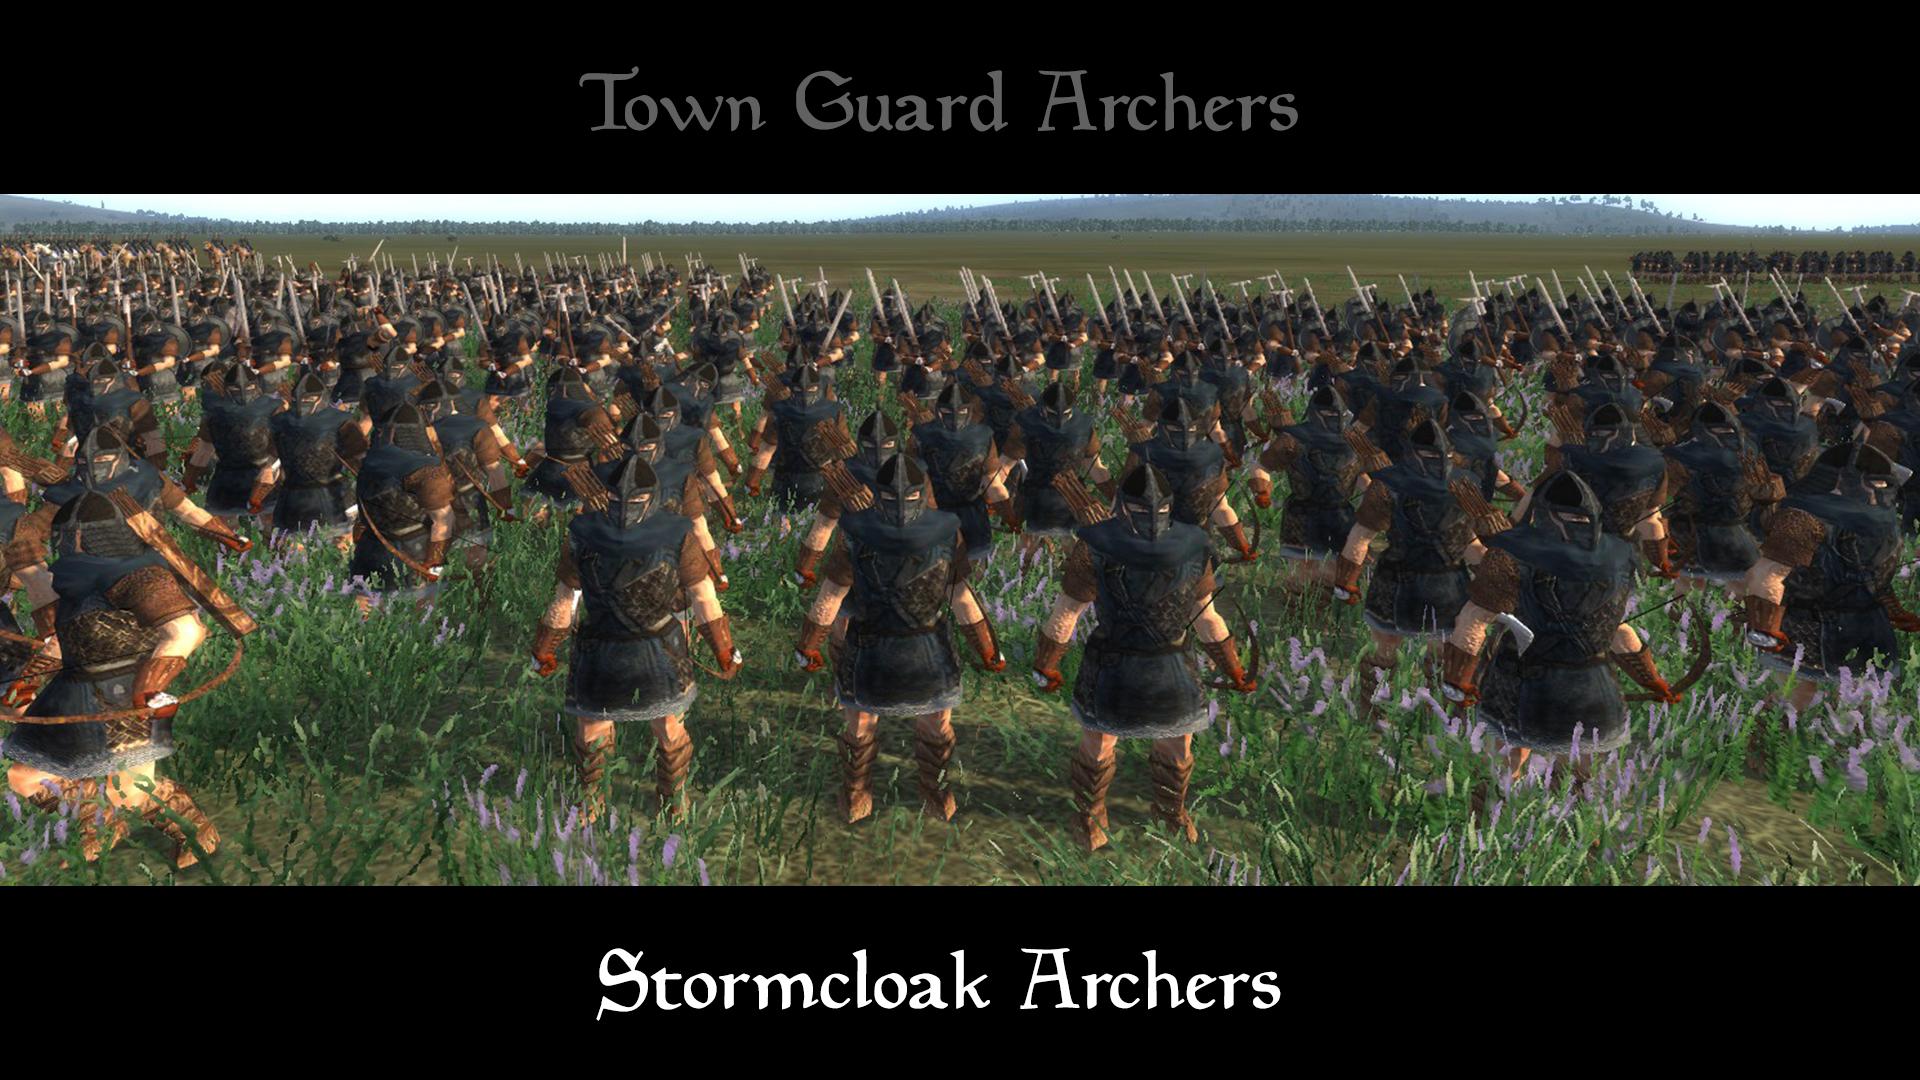 stormcloak archers